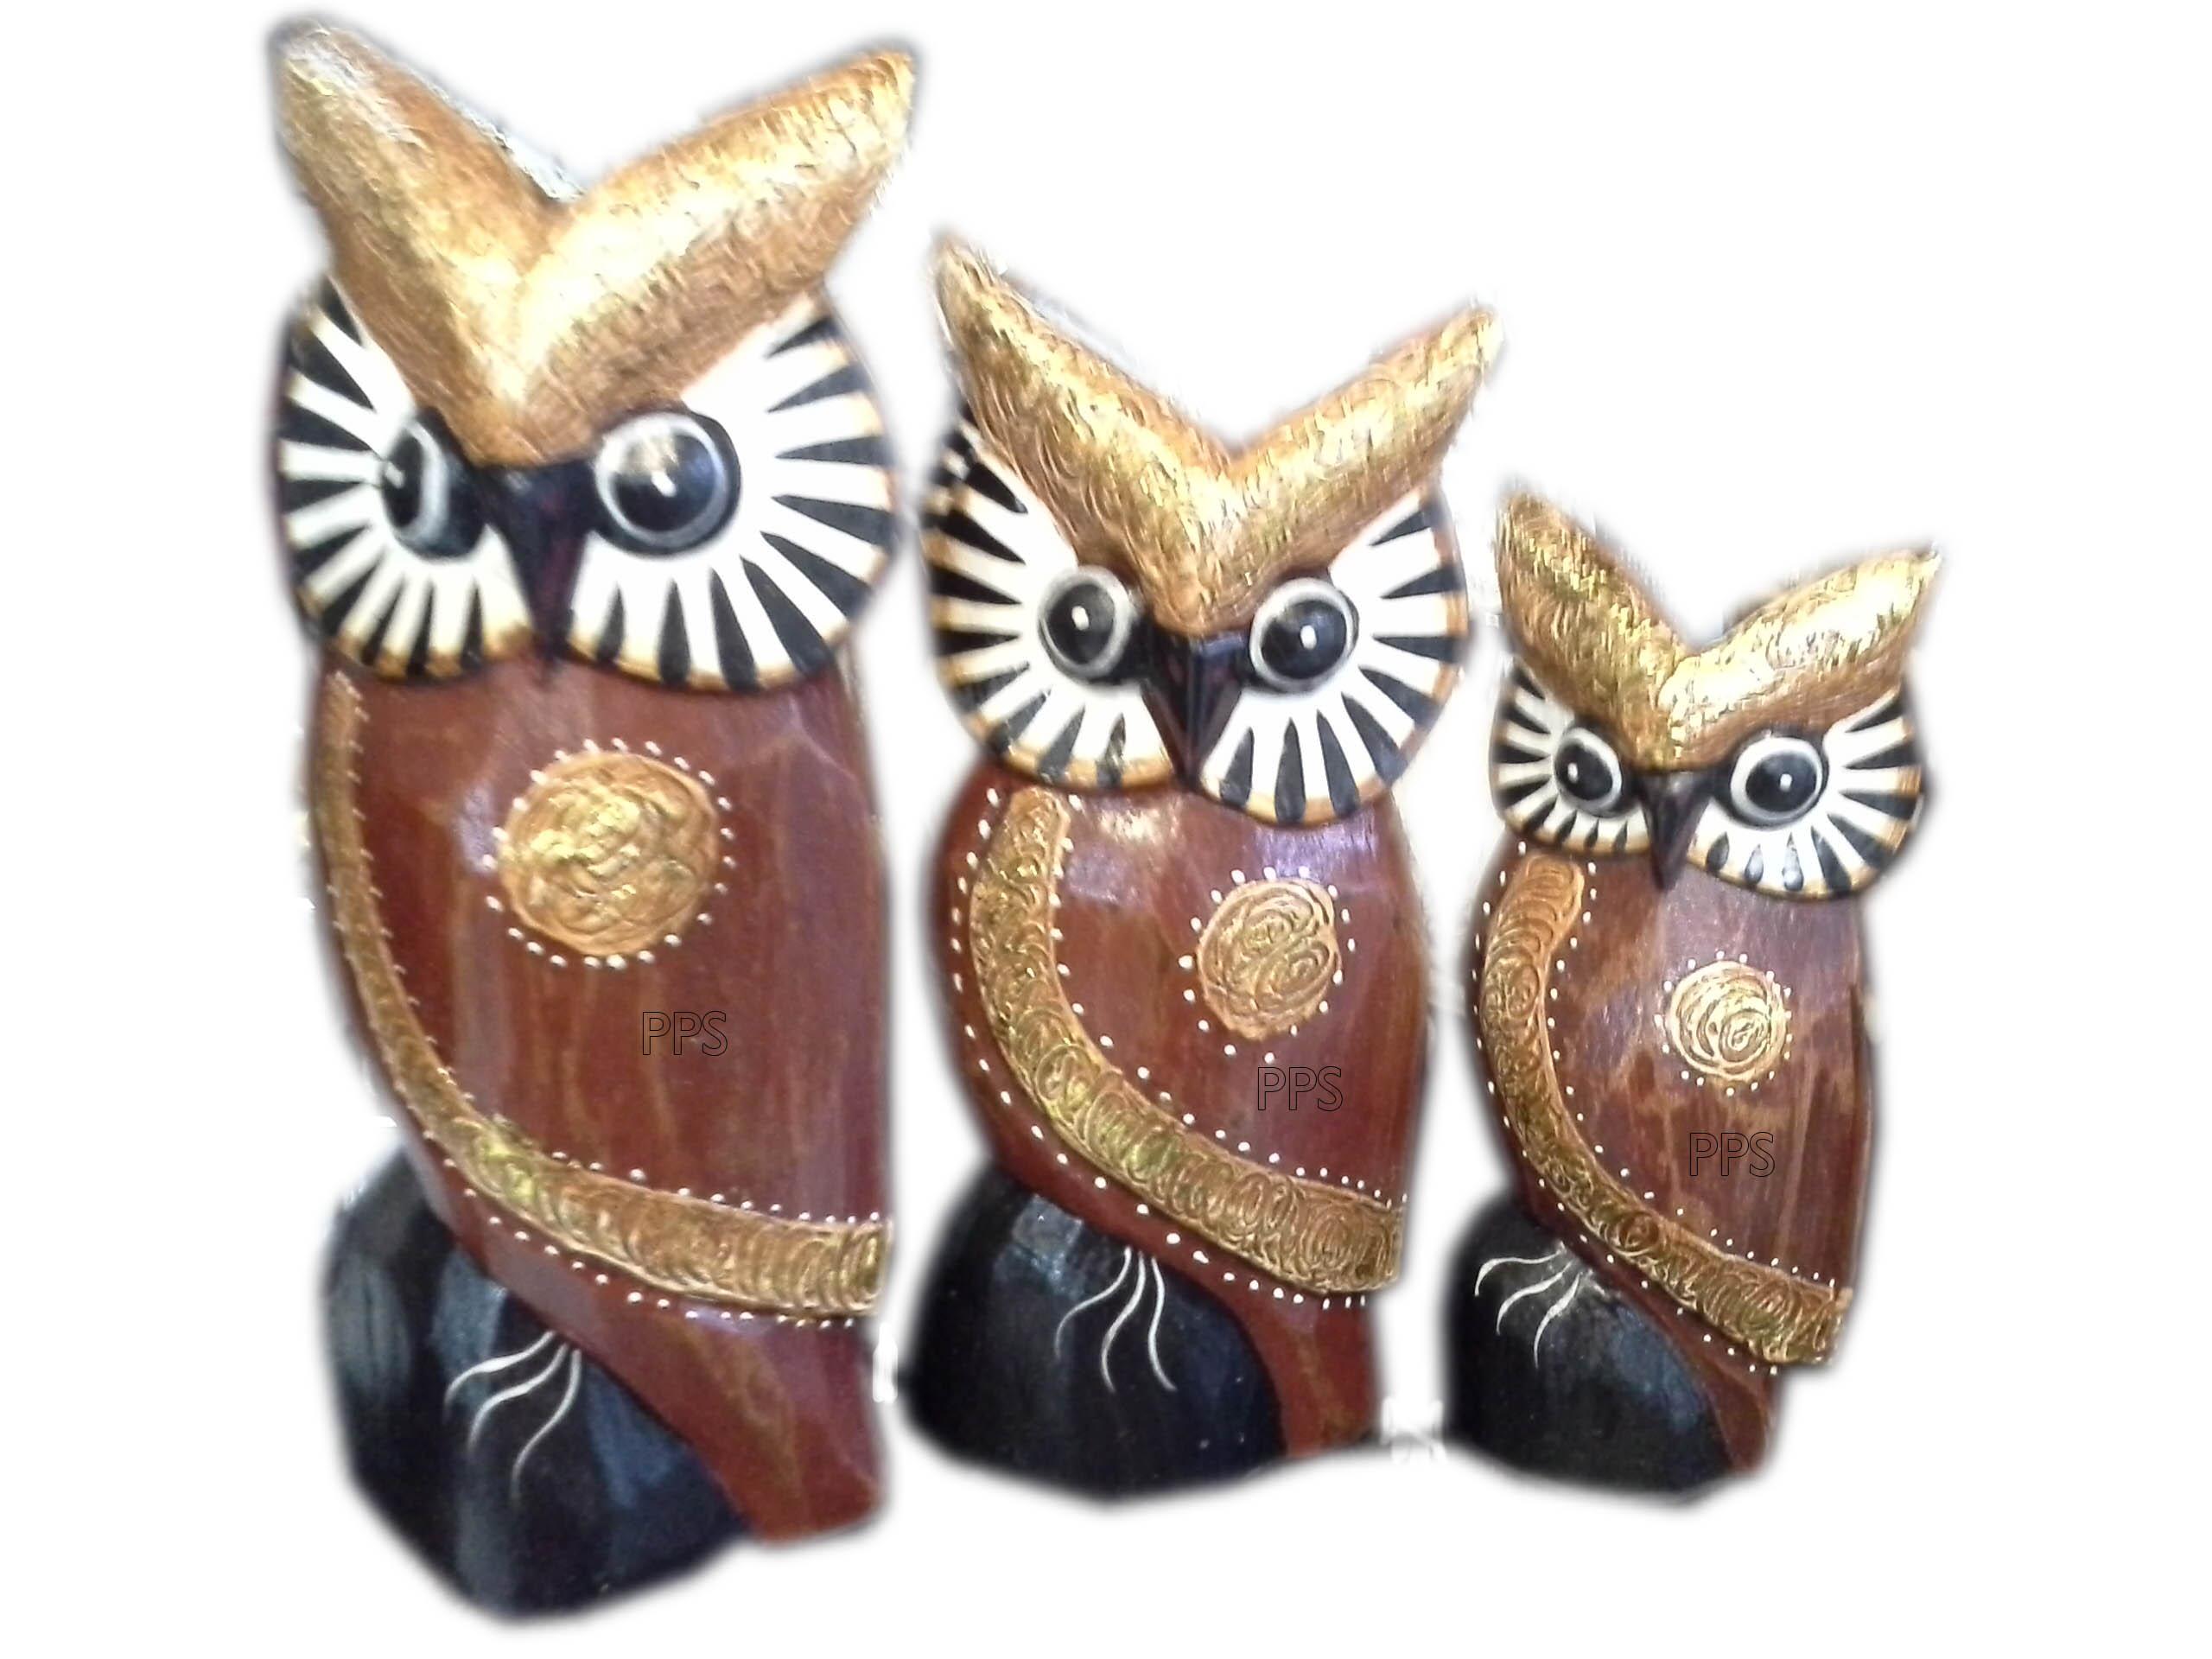 Brown 3 owls